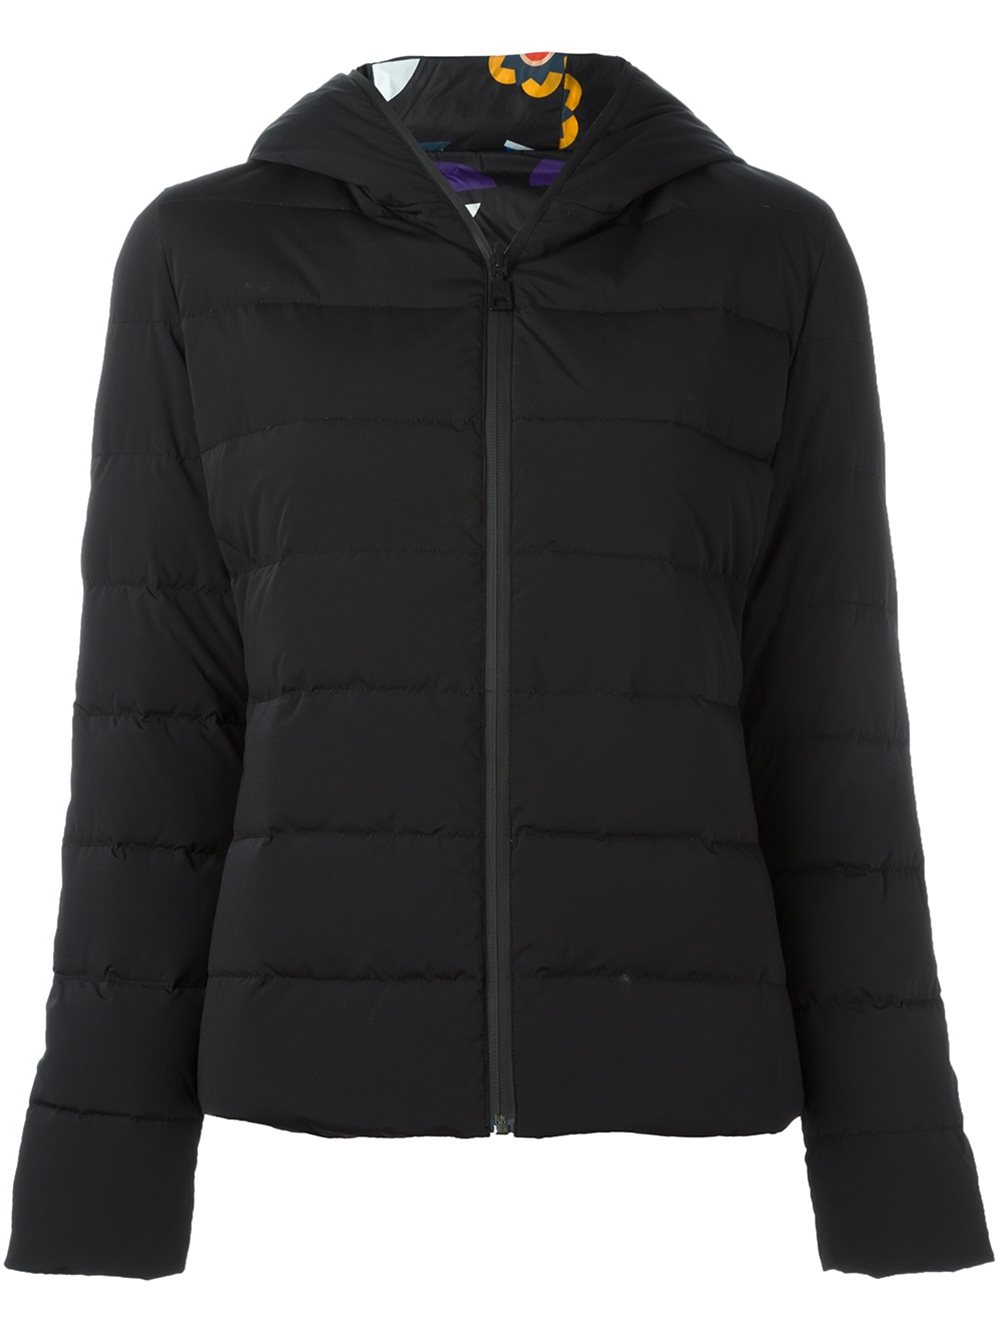 0ece113406dec8 Fendi Reversible Bag Bugs Puffer Jacket in Black | Lyst